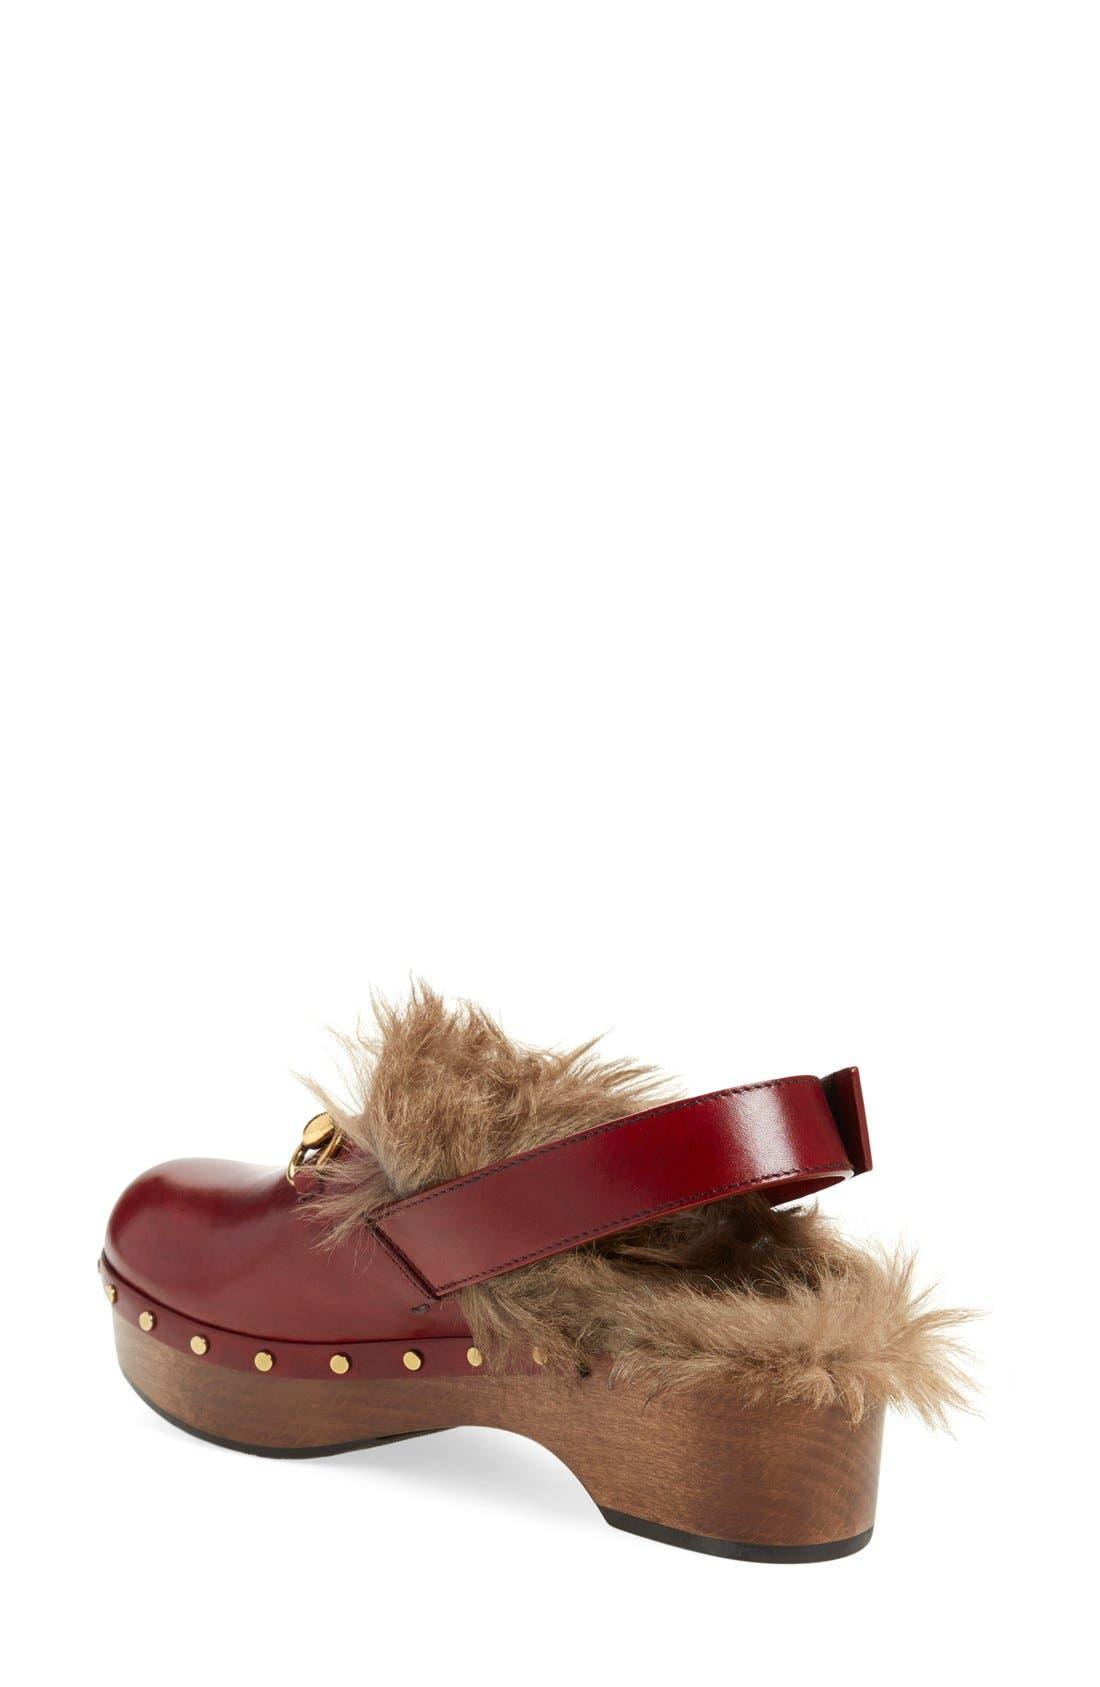 'Amstel' Genuine Kangaroo Fur Clog,                             Alternate thumbnail 2, color,                             Burgundy/ Red